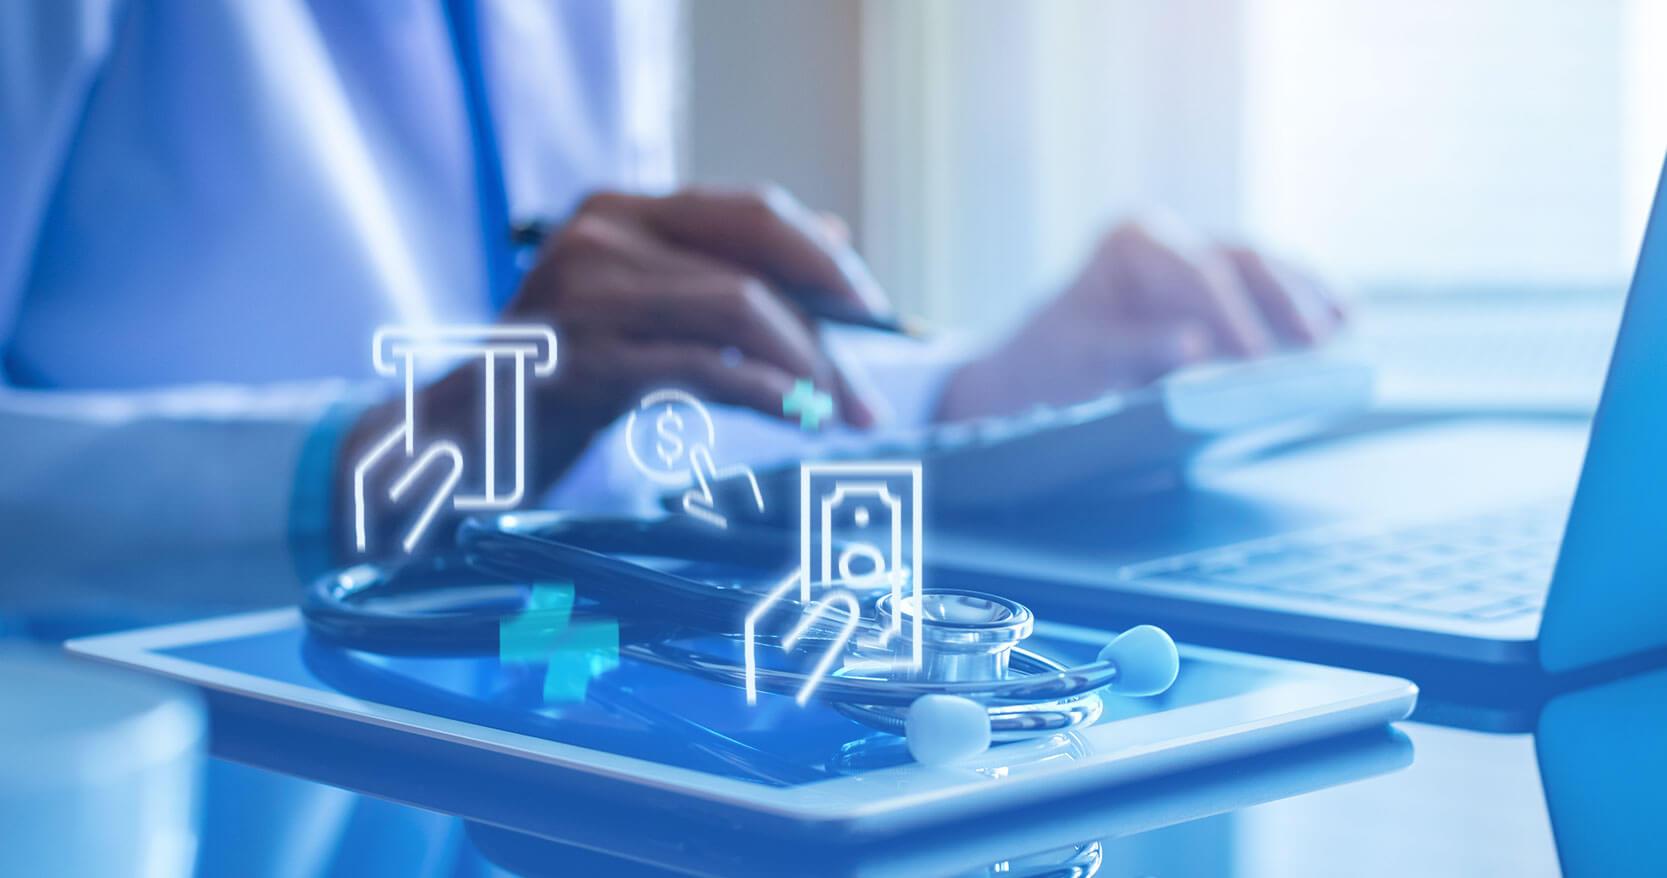 Sistema financeiro para médicos